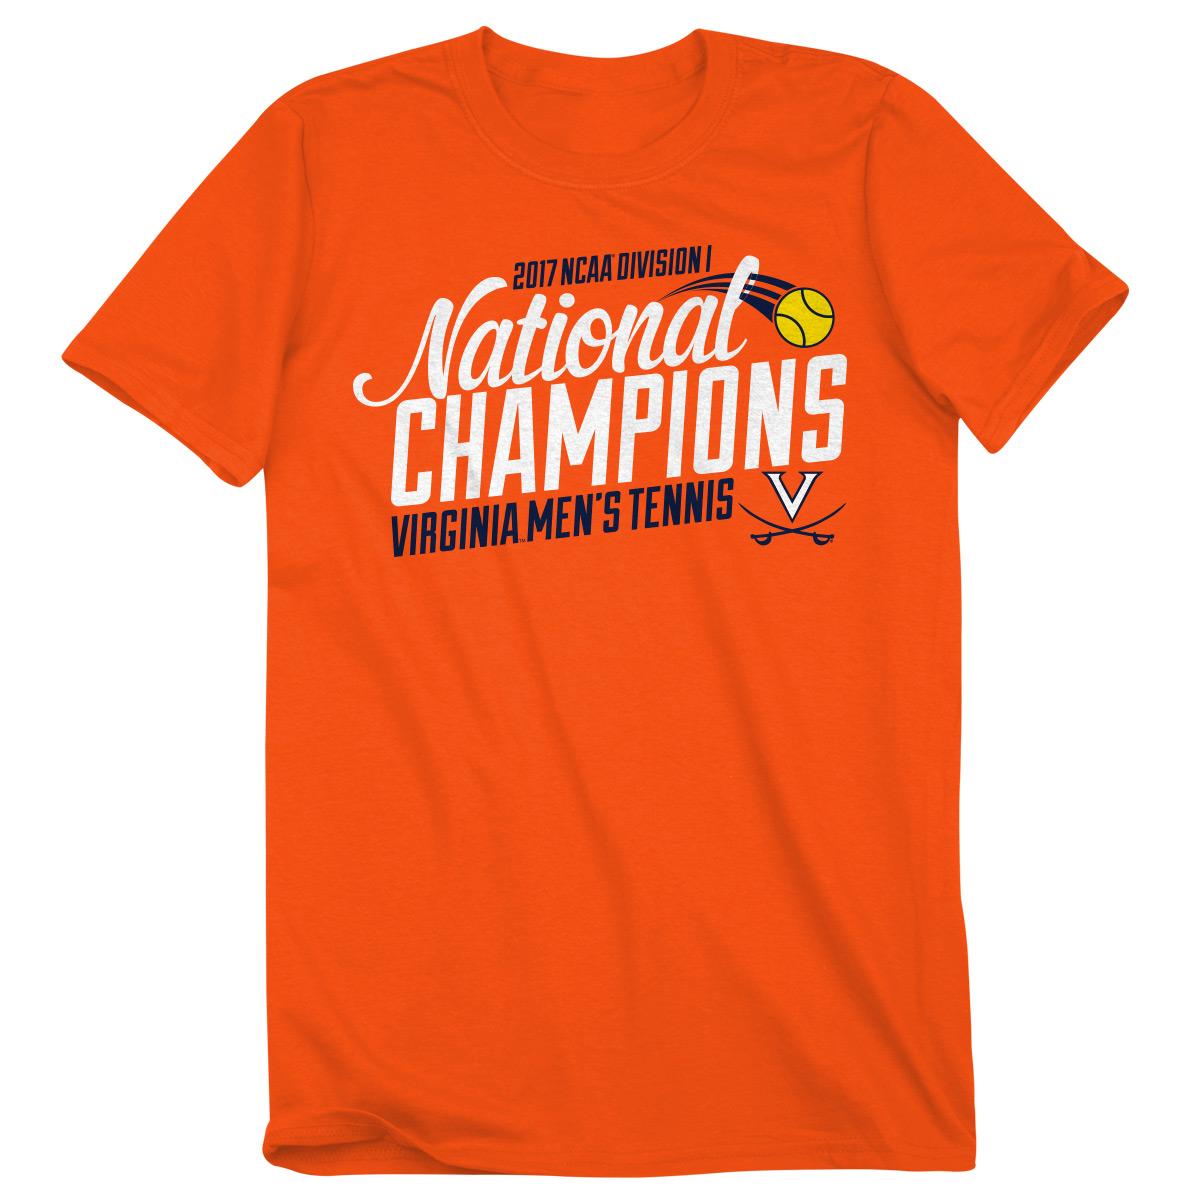 University of Virginia Tennis 2017 NCAA Champions T-shirt